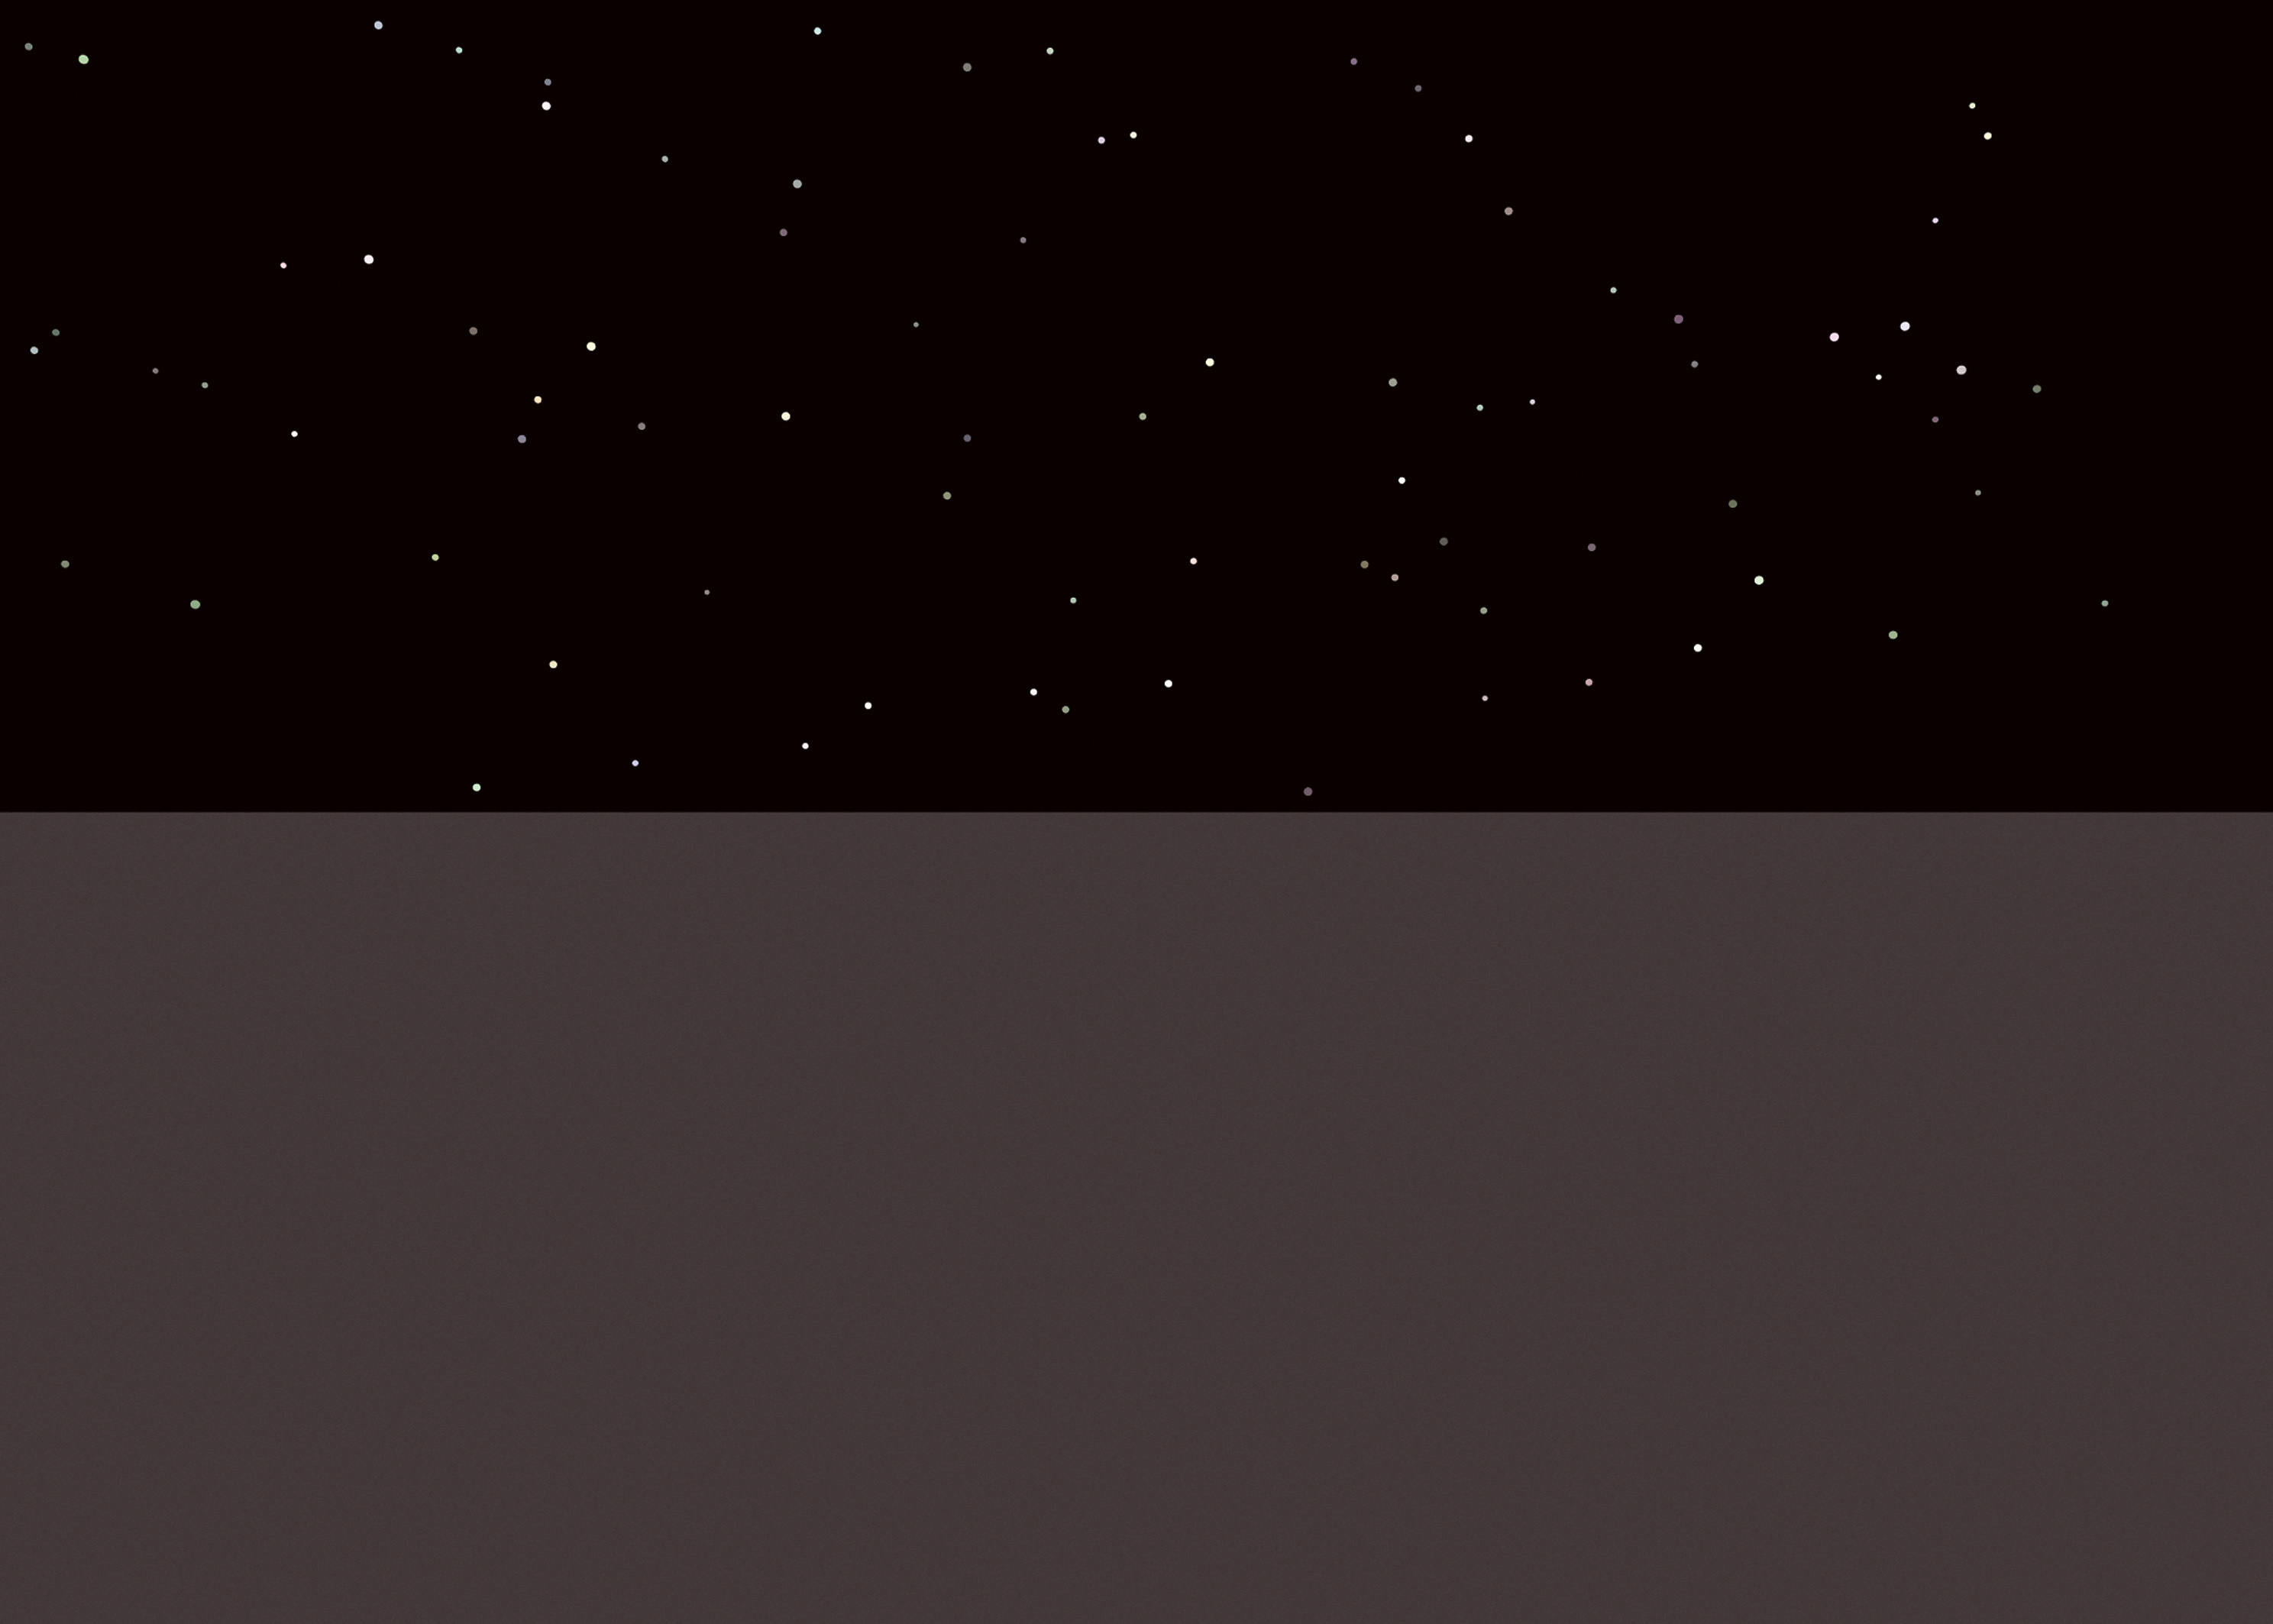 Untitled (Default Atmospheres No. 9), 2003 |  | ProjecteSD